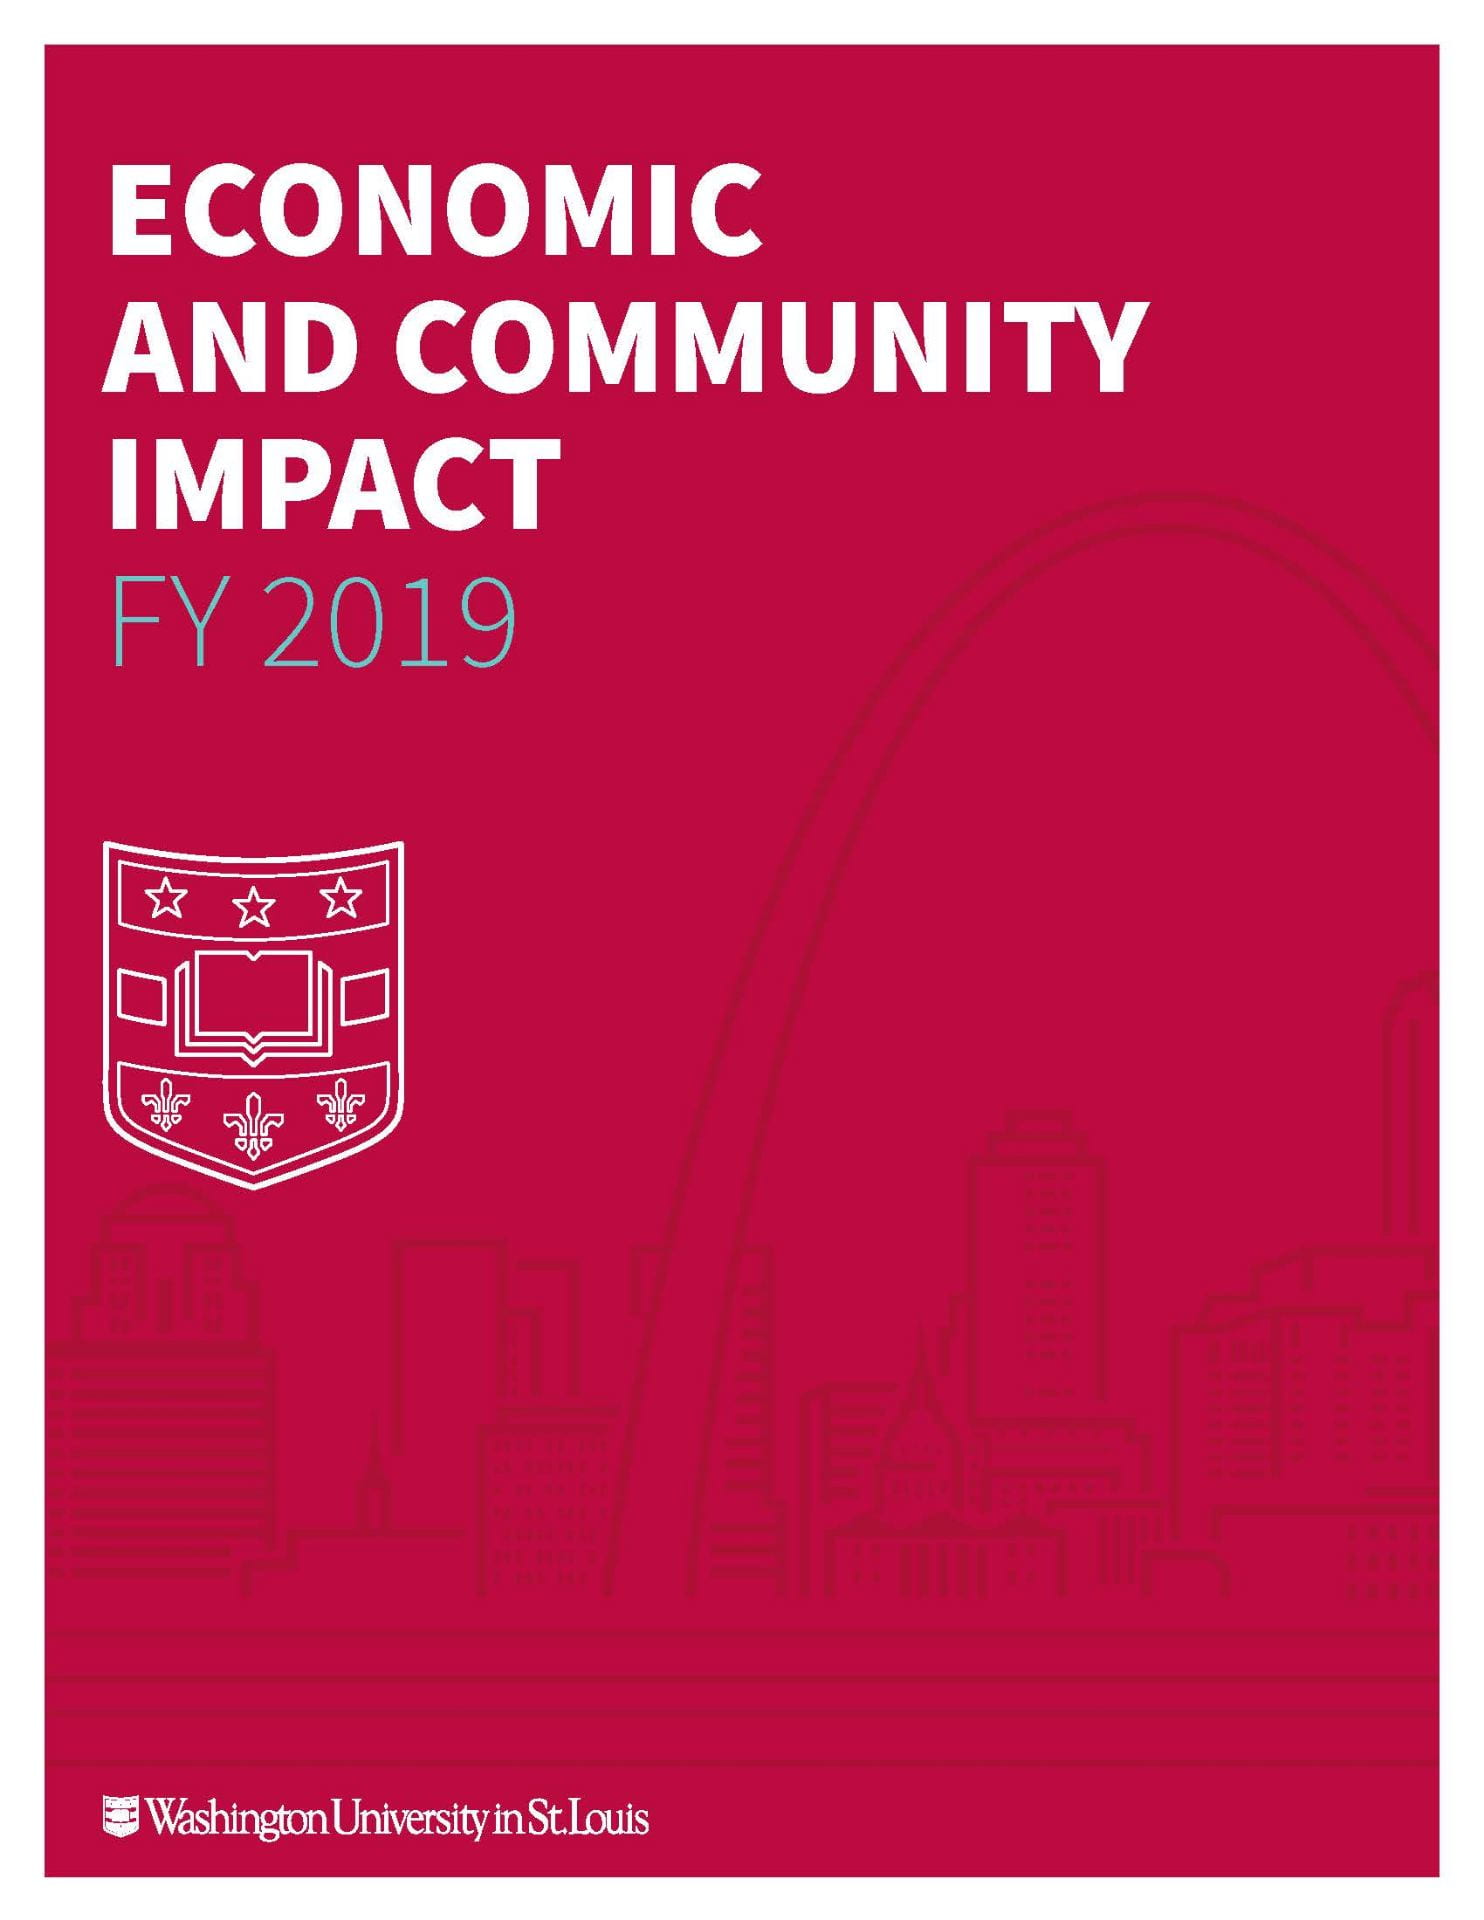 Economic and Community Impact FY 2019